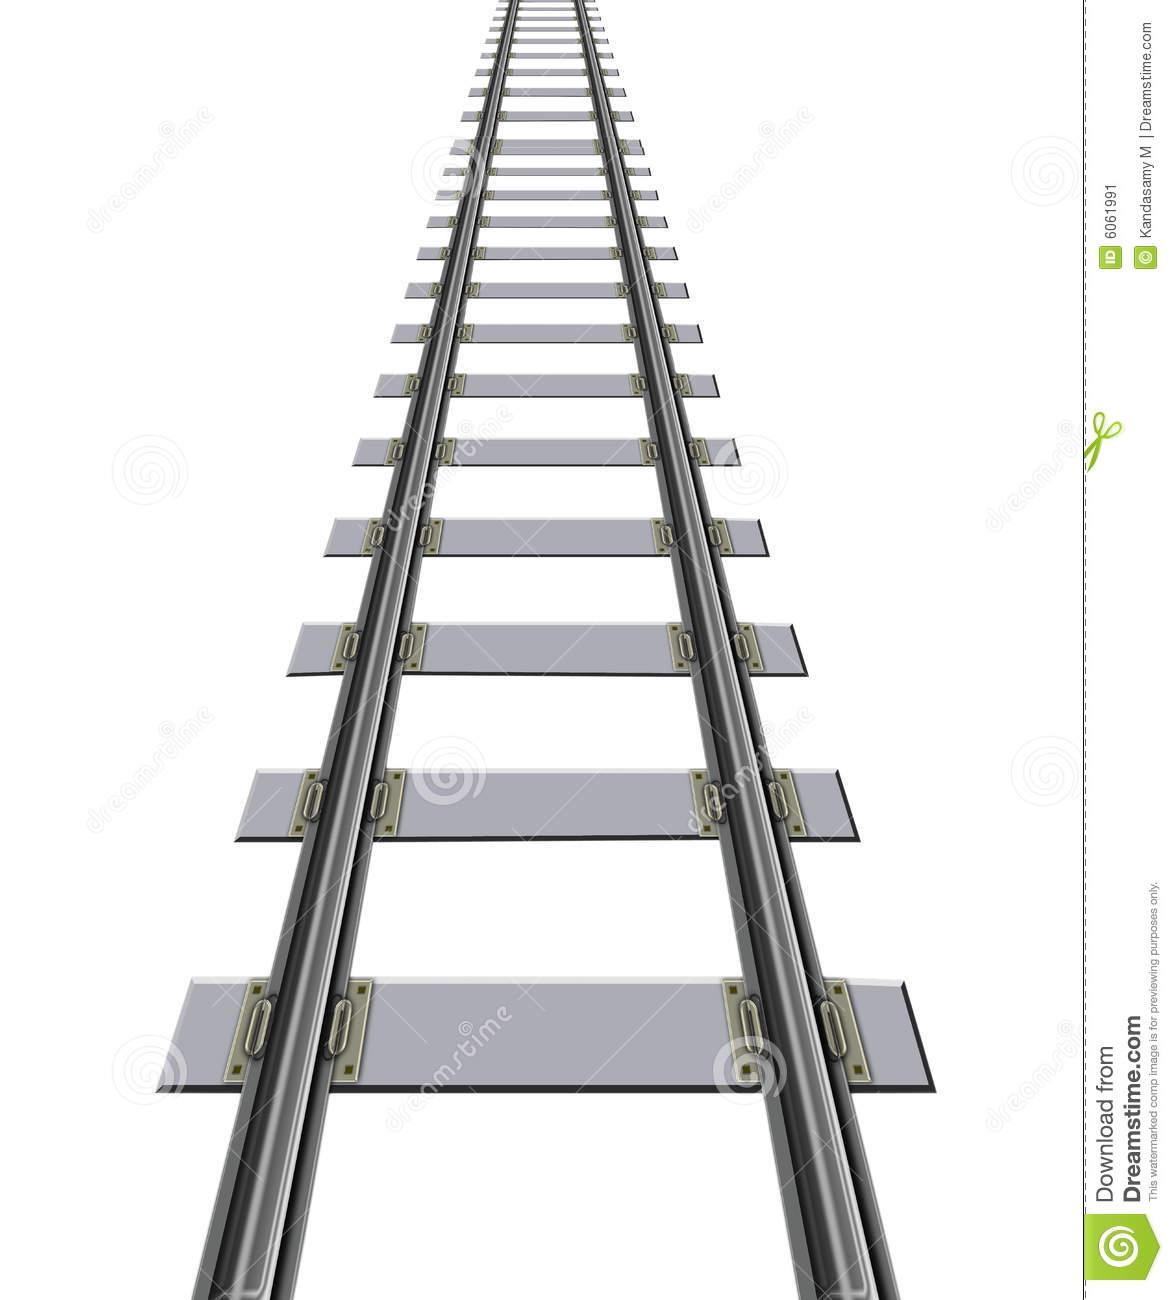 Horizontal Train Tracks Clipart Panda